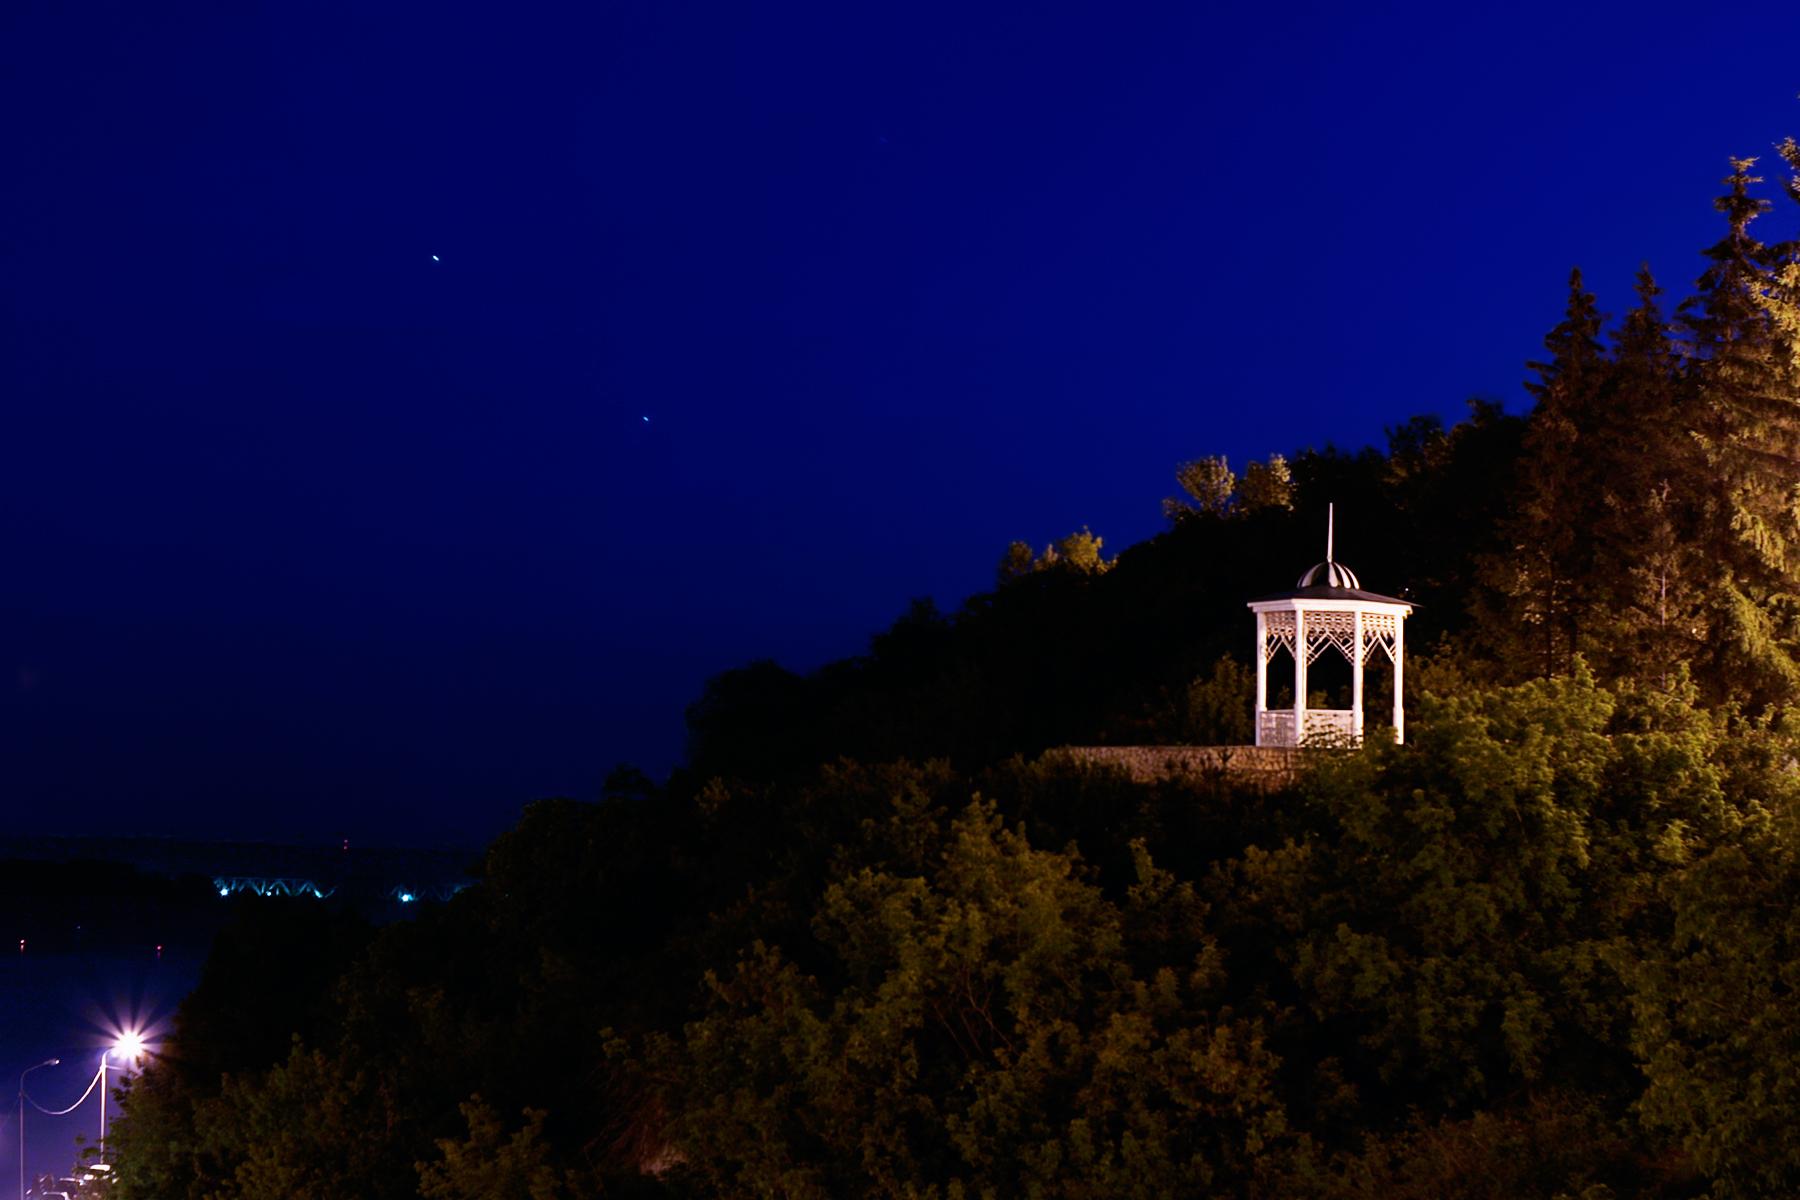 Night scene, Dark, Outdoos, Ufa, Trees, HQ Photo